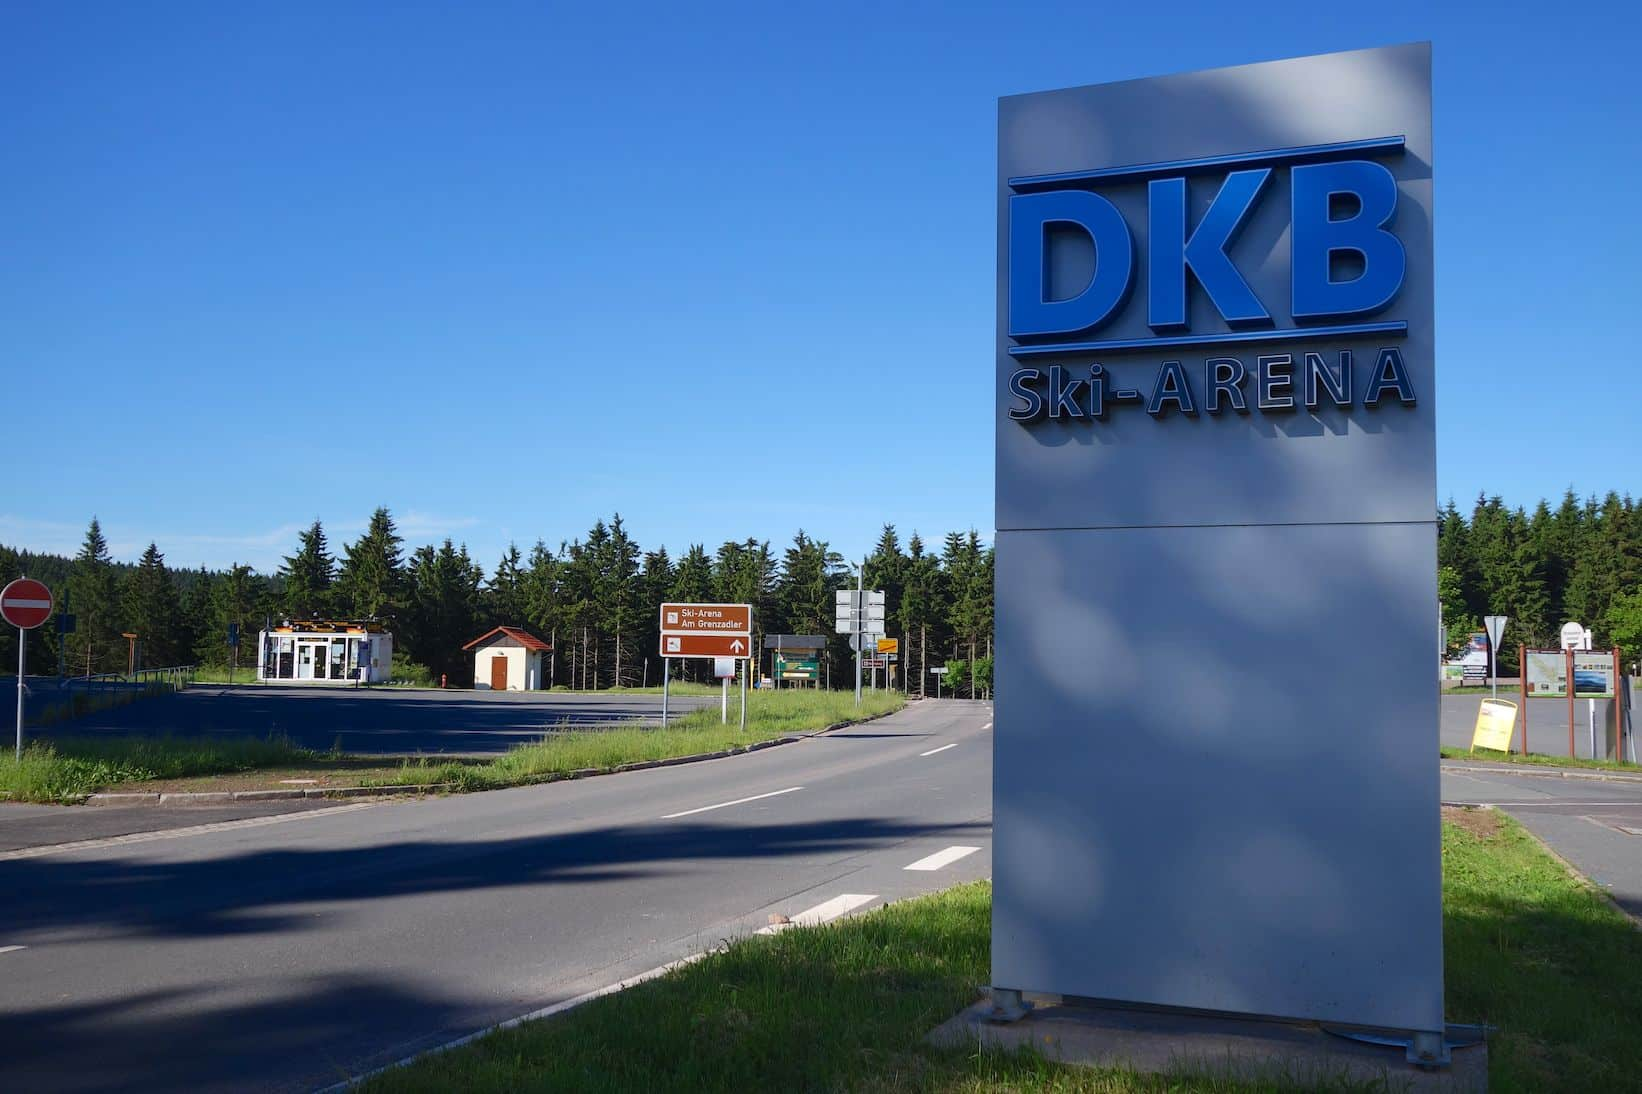 DKB Ski-Arena